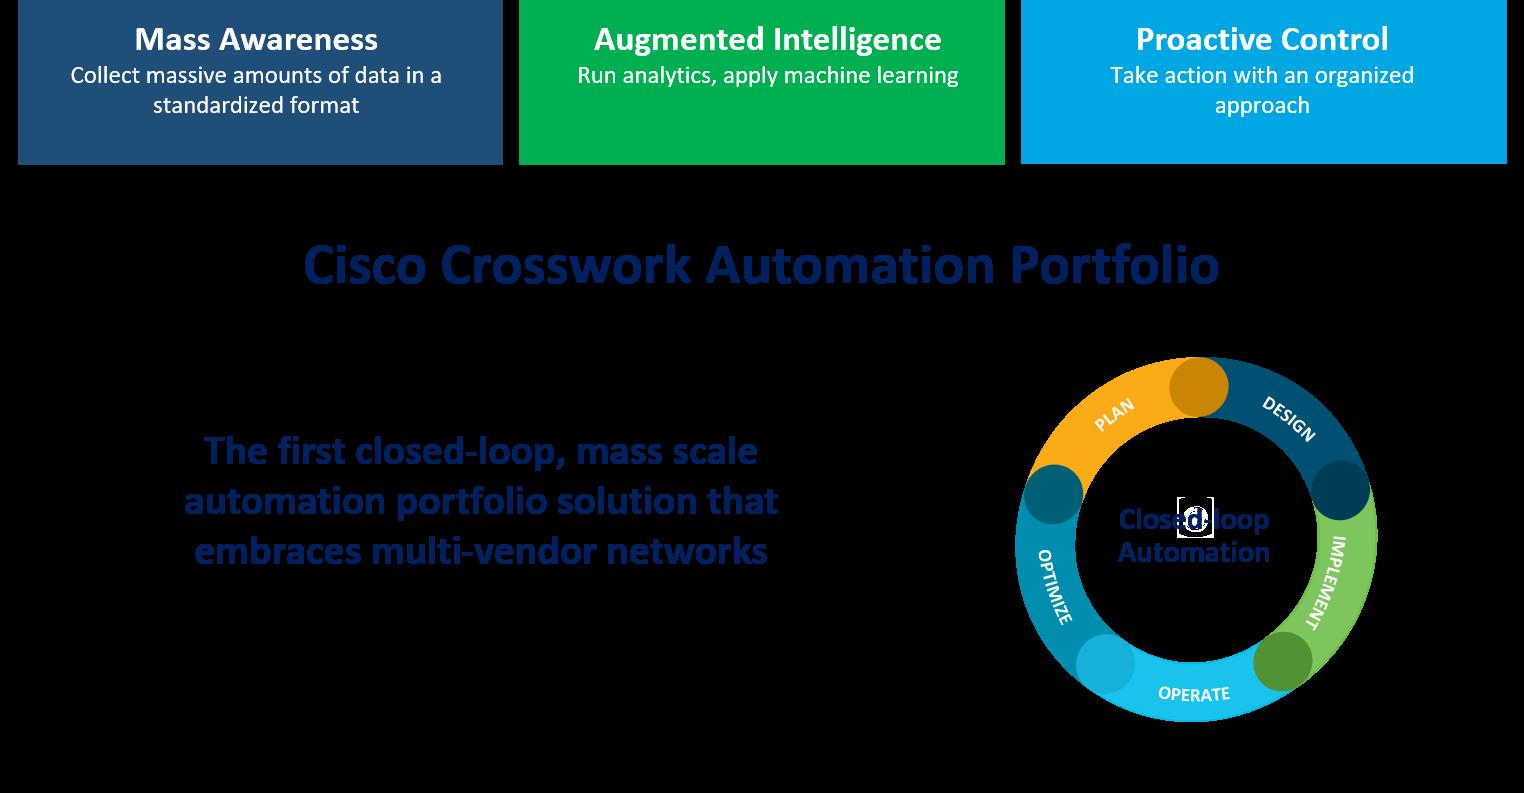 Cisco Crosswork Automation Portfolio